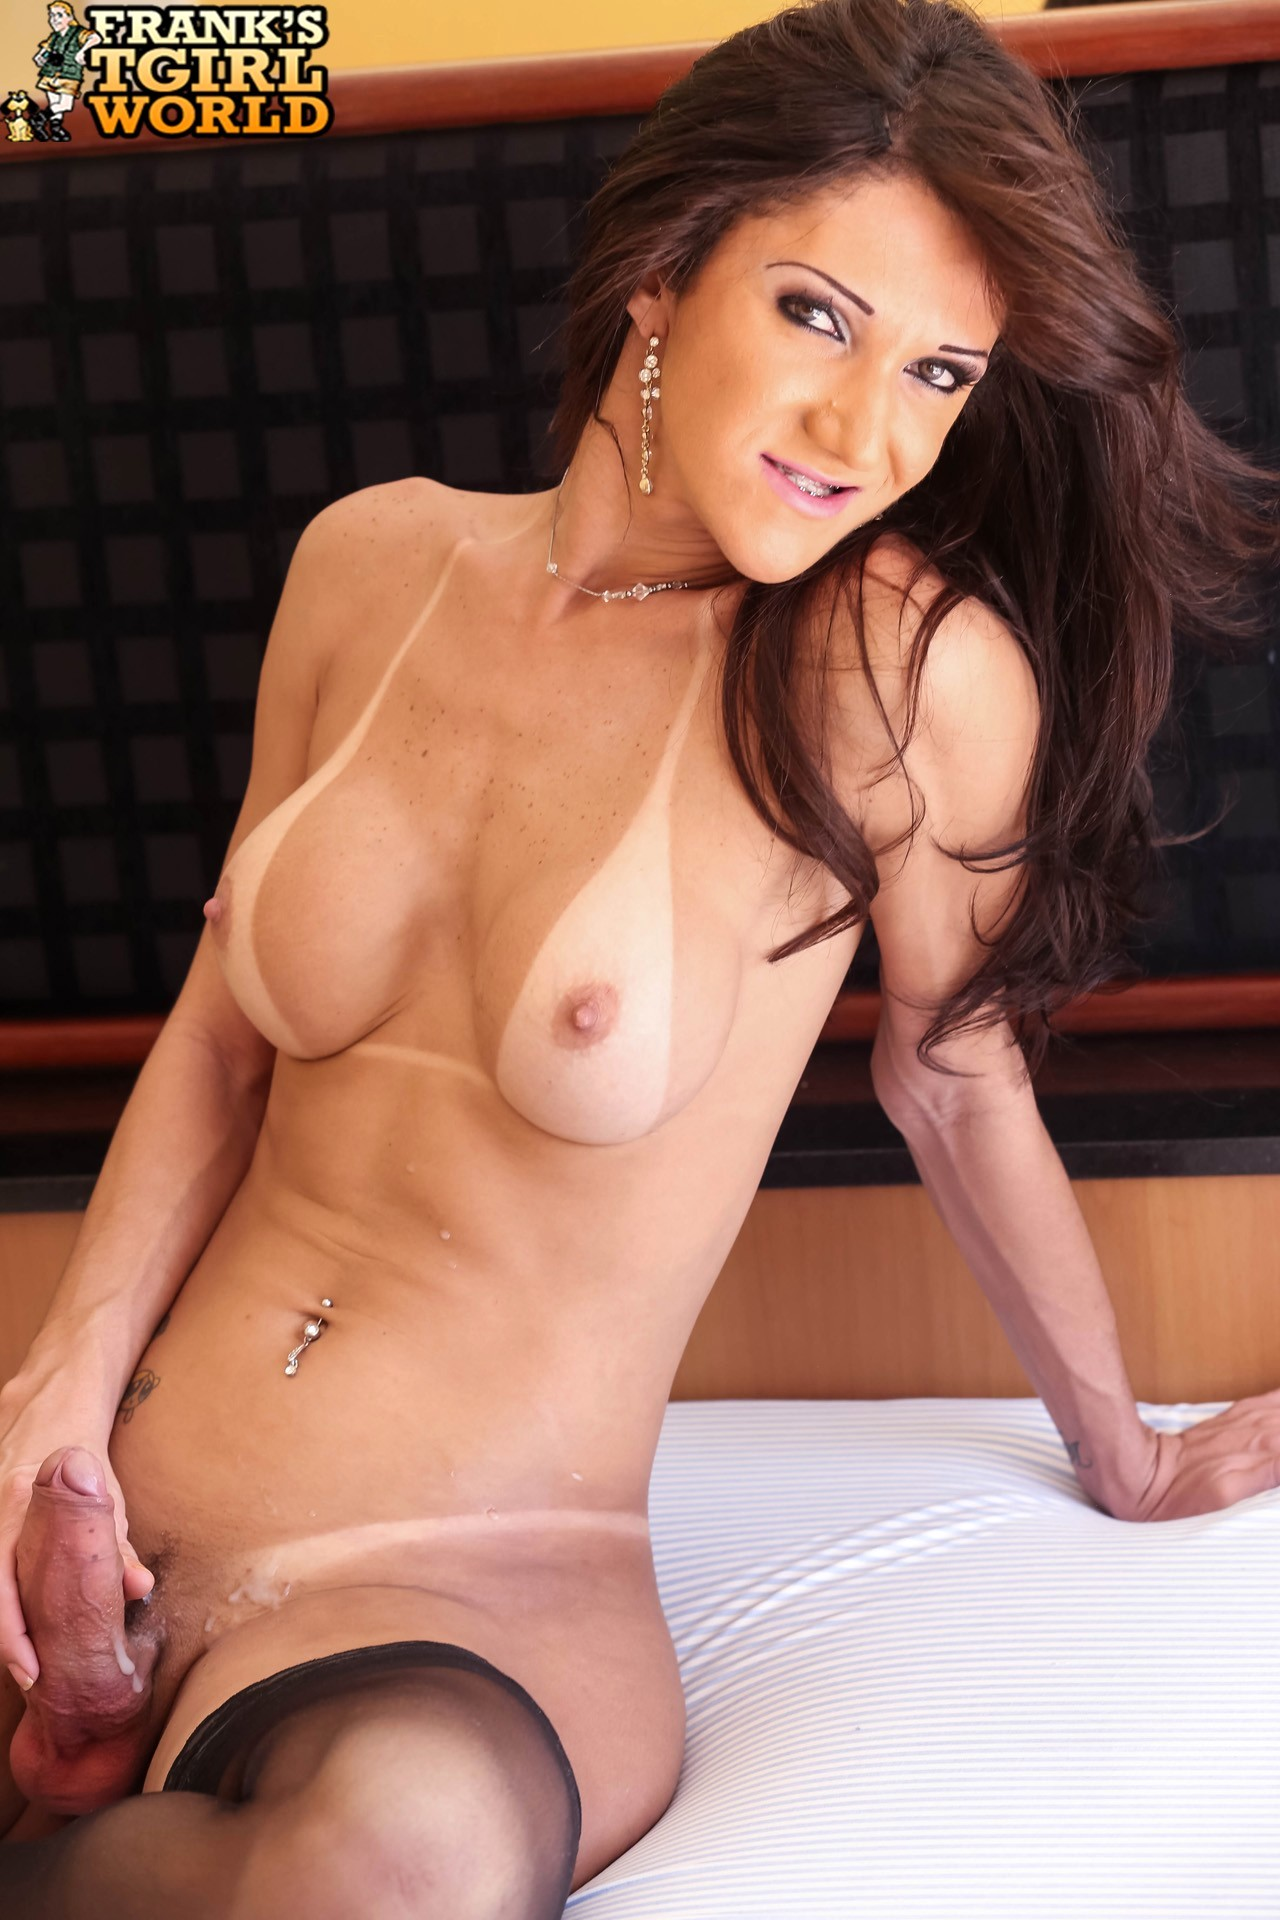 Fernanda Lohany Proud Of Her Massive Dick